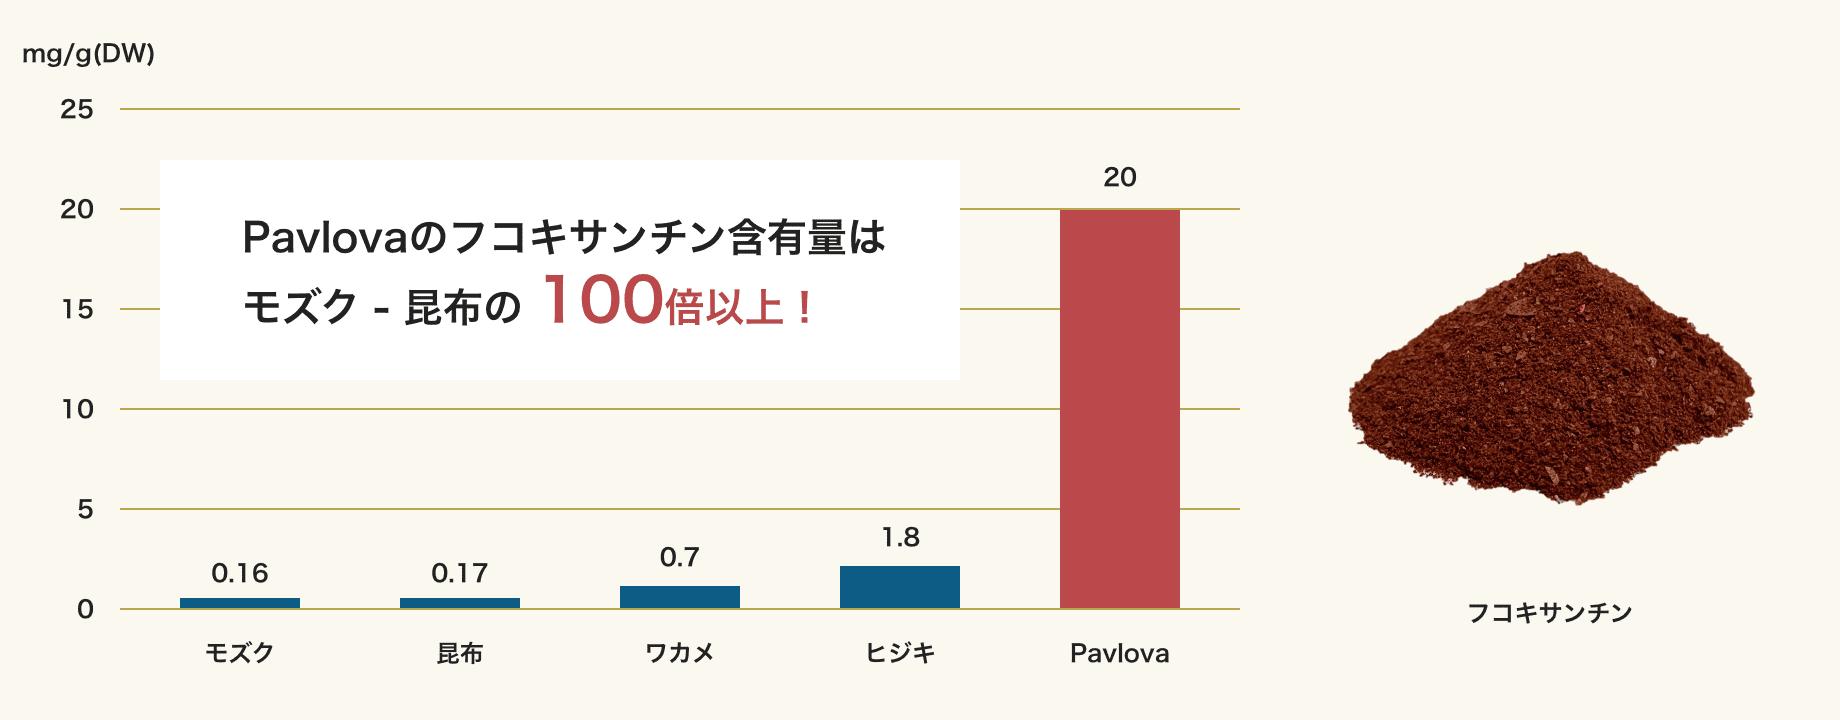 Pavlovaのフコキサンチン含有量は モズク - 昆布の 100倍以上!